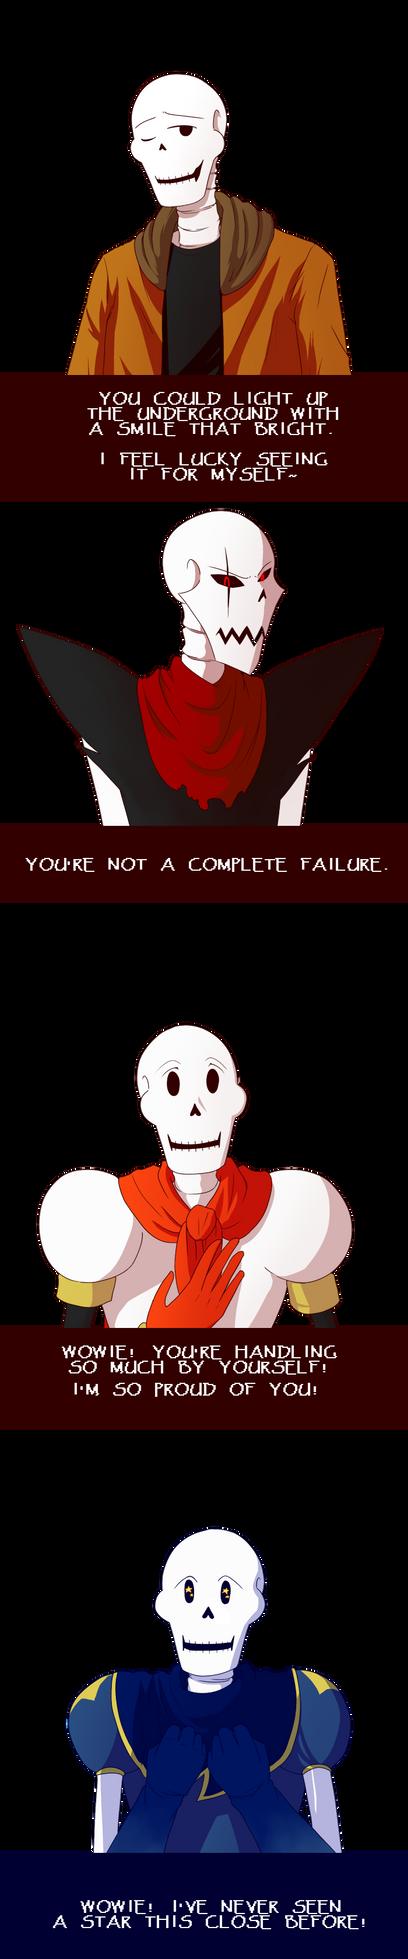 Encouragement by Maxlad